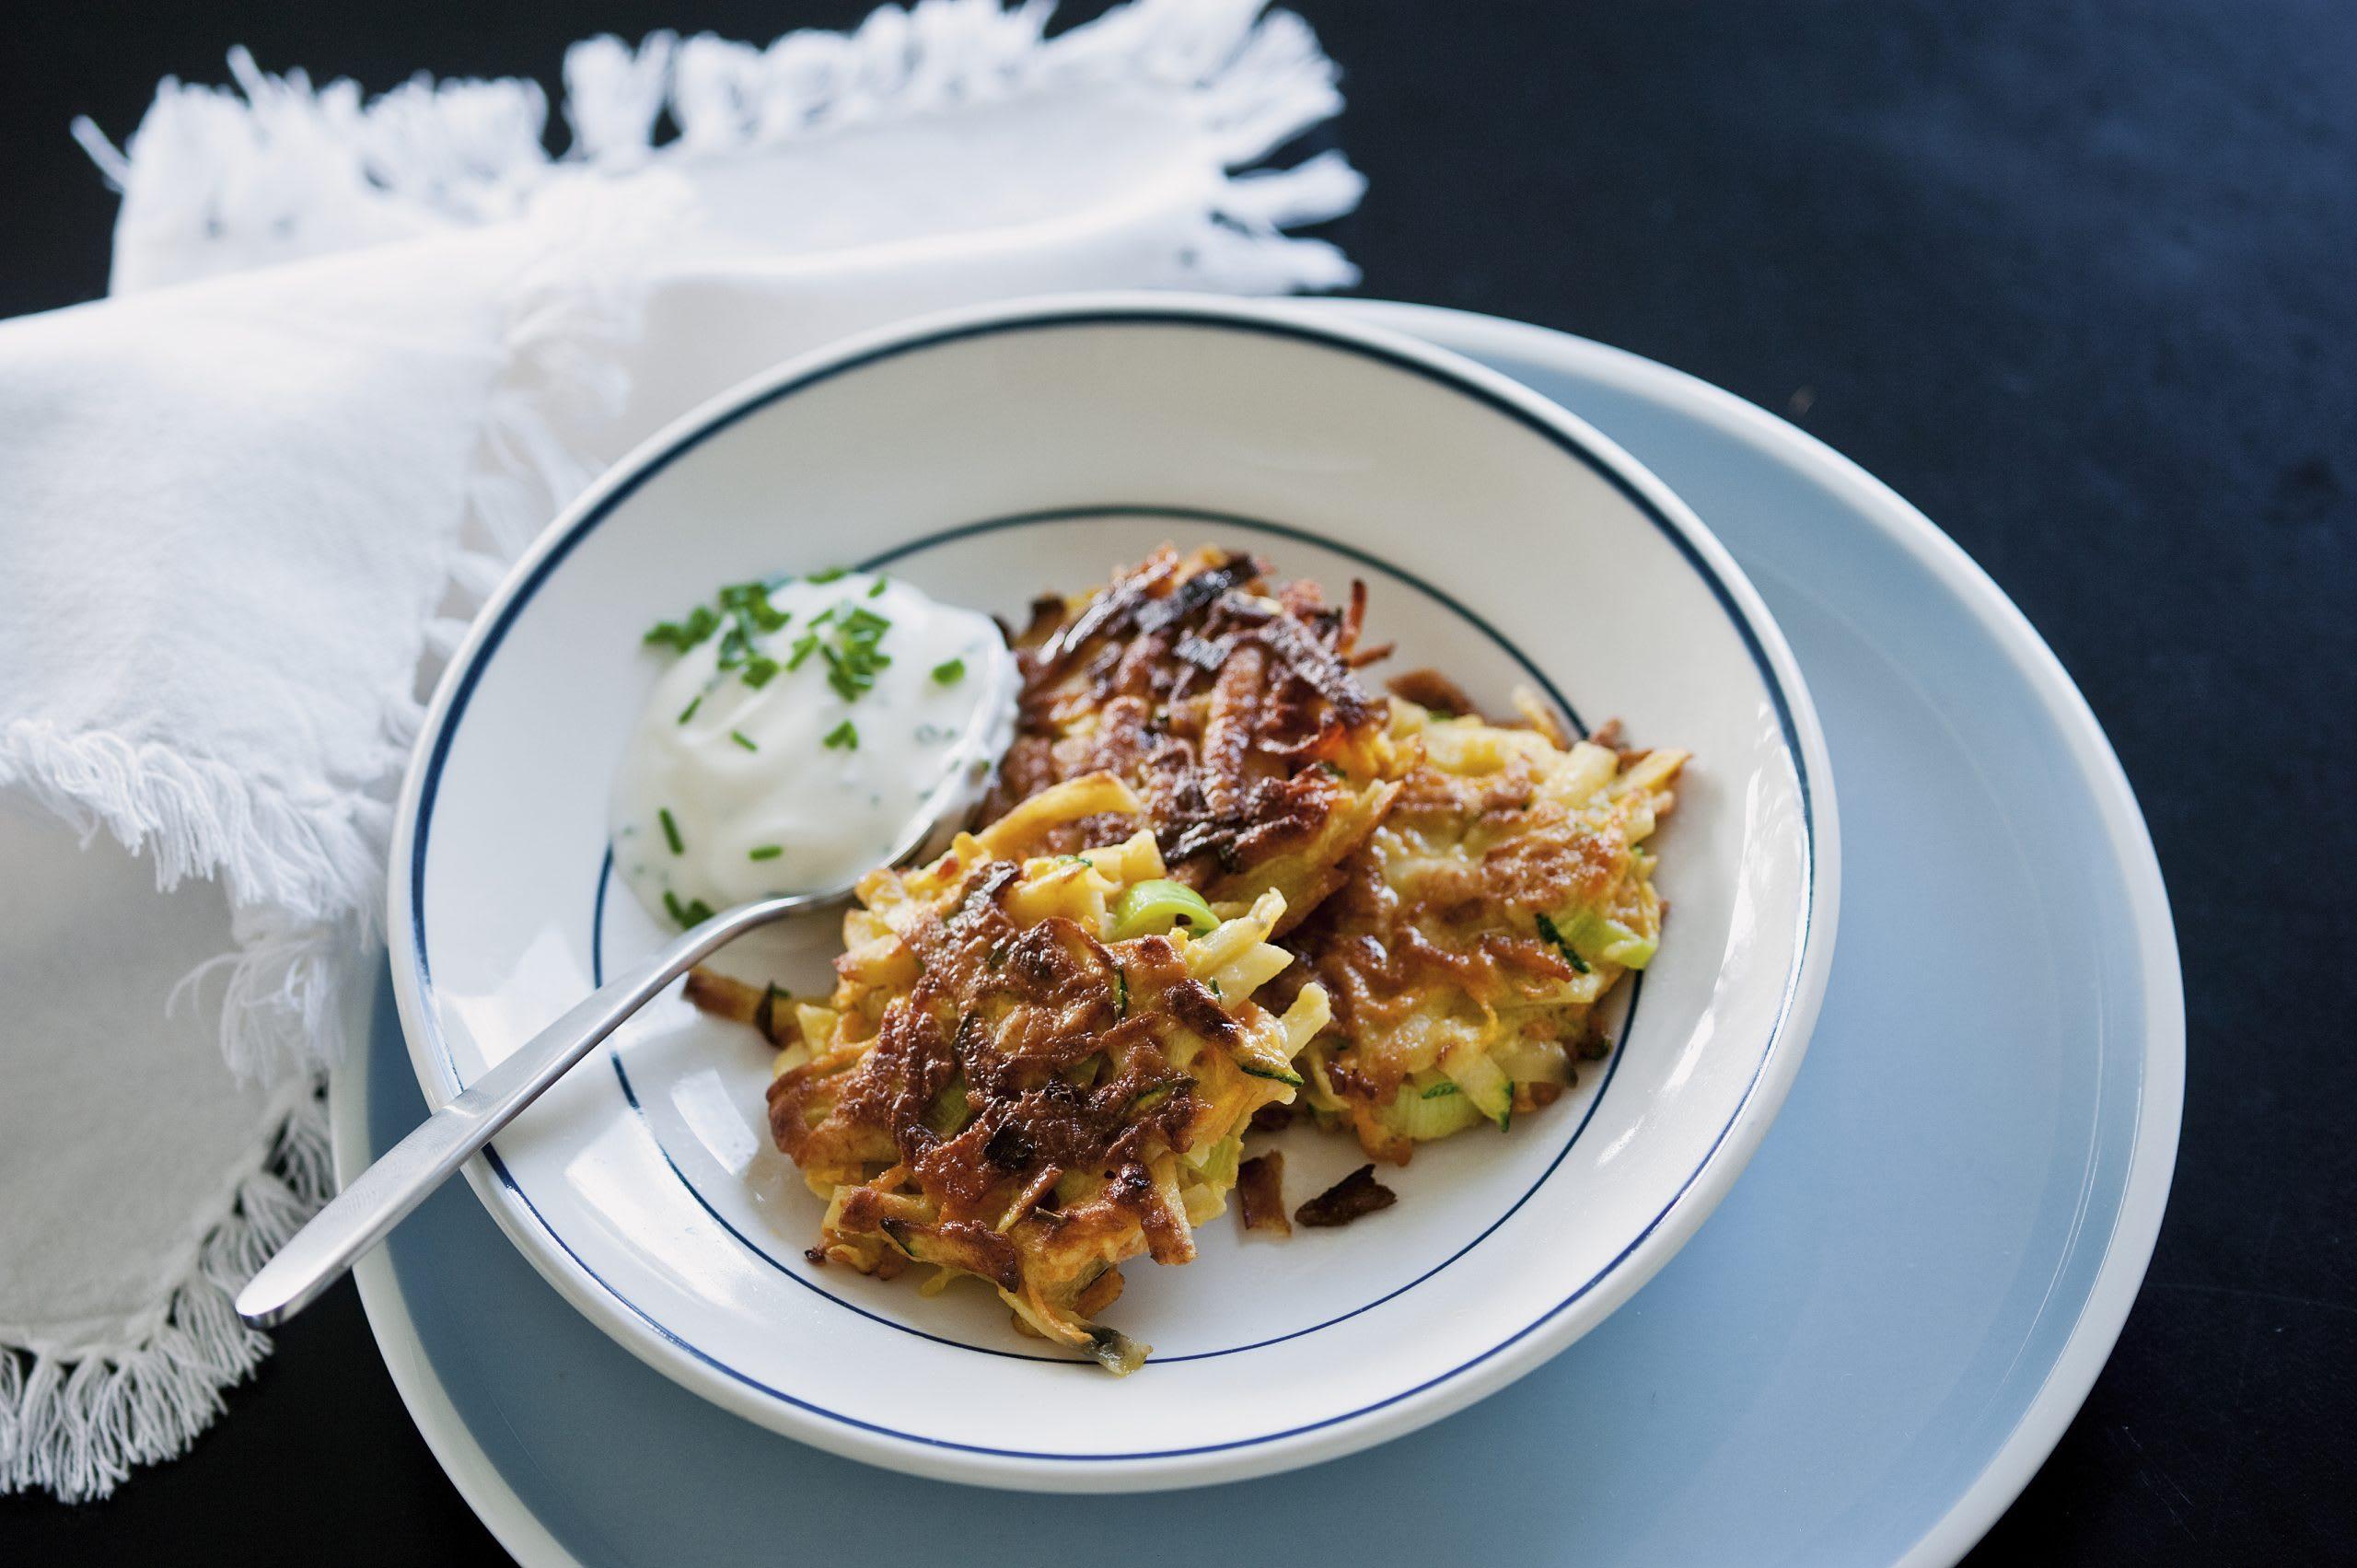 Kartoffel-Gemüseküchlein mit Kräuterquark